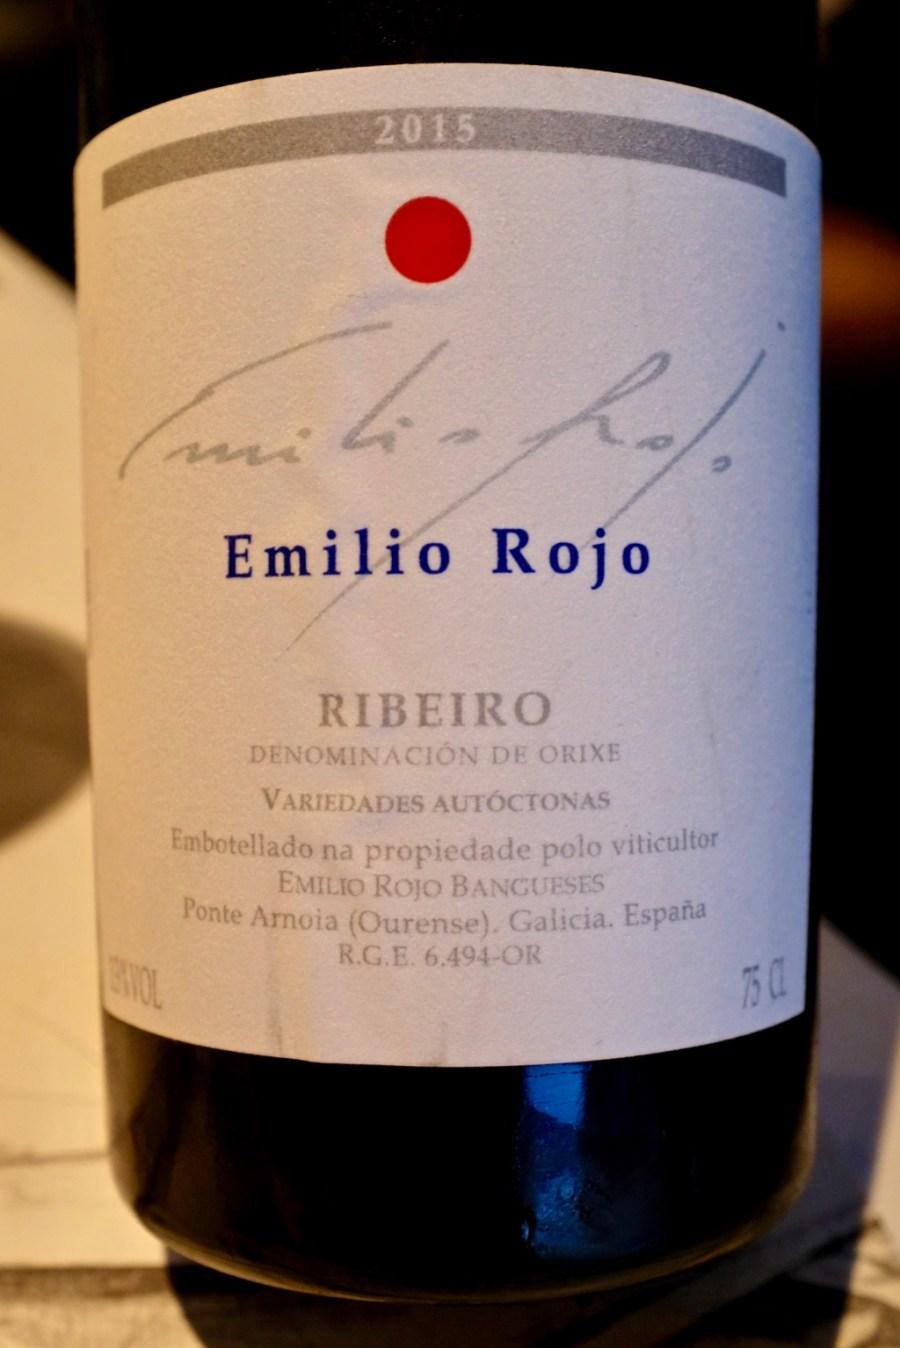 Arzak - Emilio Rojo, Ribeiro 2015, Galicia, Spain